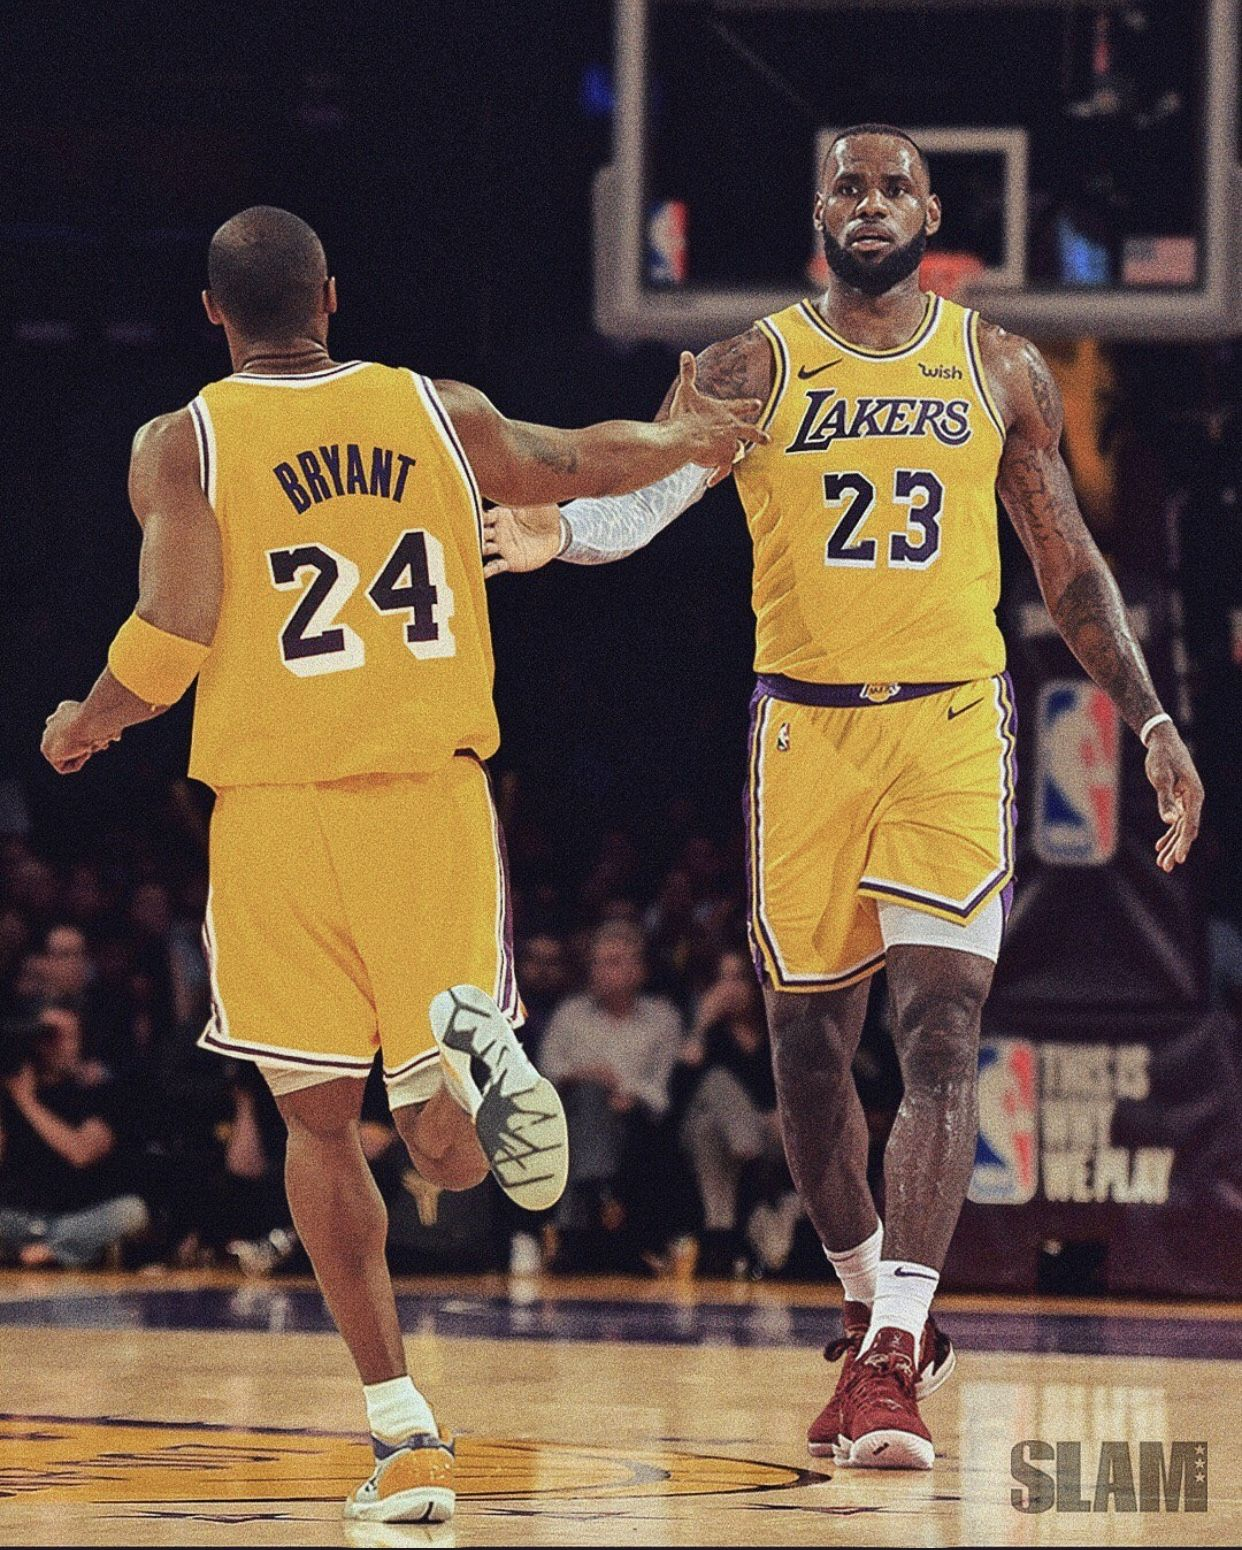 Lebron James Kobe Bryant In 2020 Kobe Bryant Lebron James Lebron James Kobe Bryant Pictures